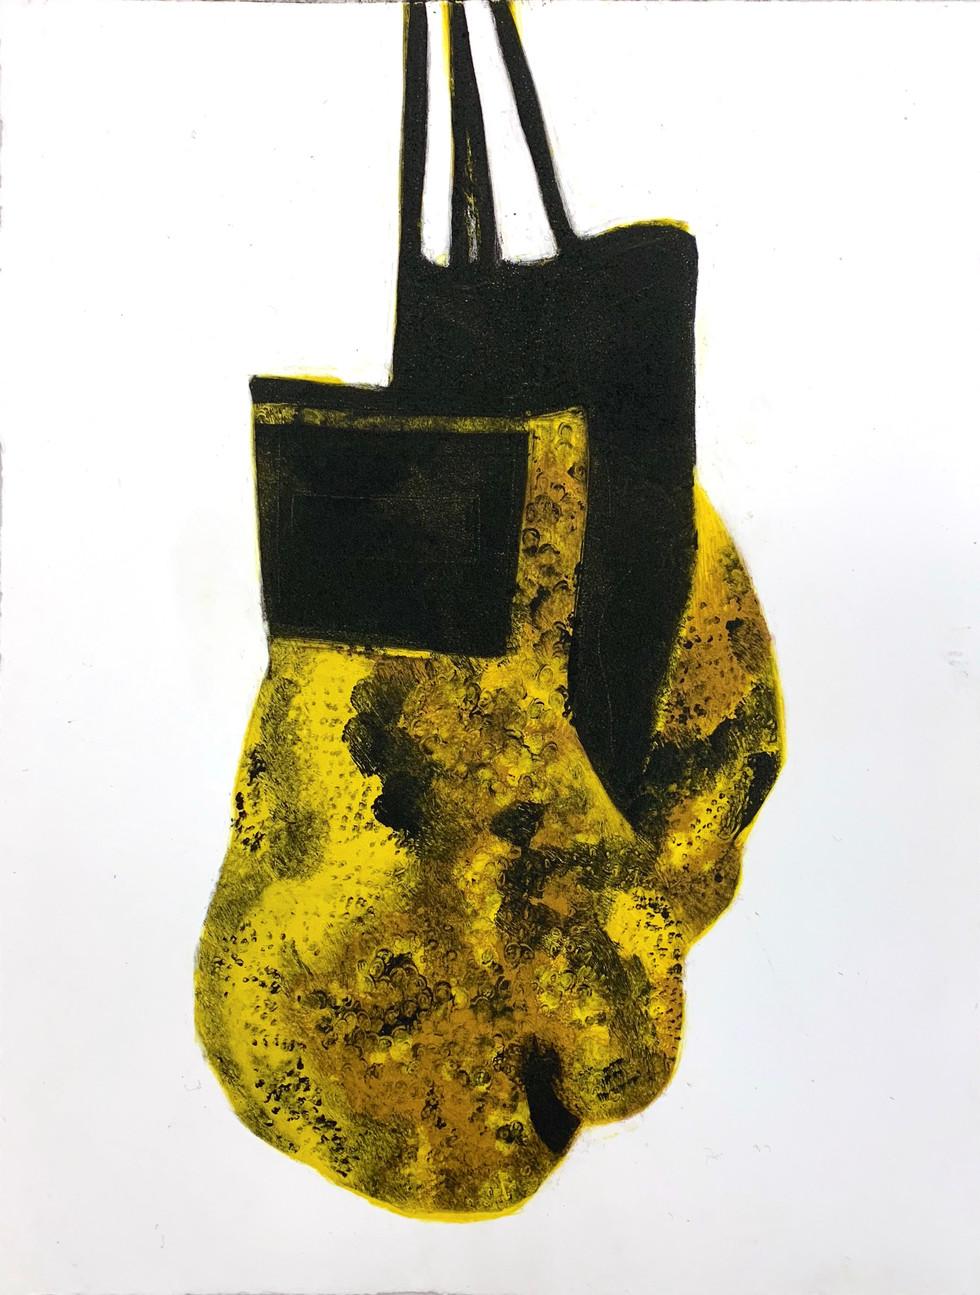 """Snakeskin Gloves 3"", monotype print, 8"" x 10"", 2020"